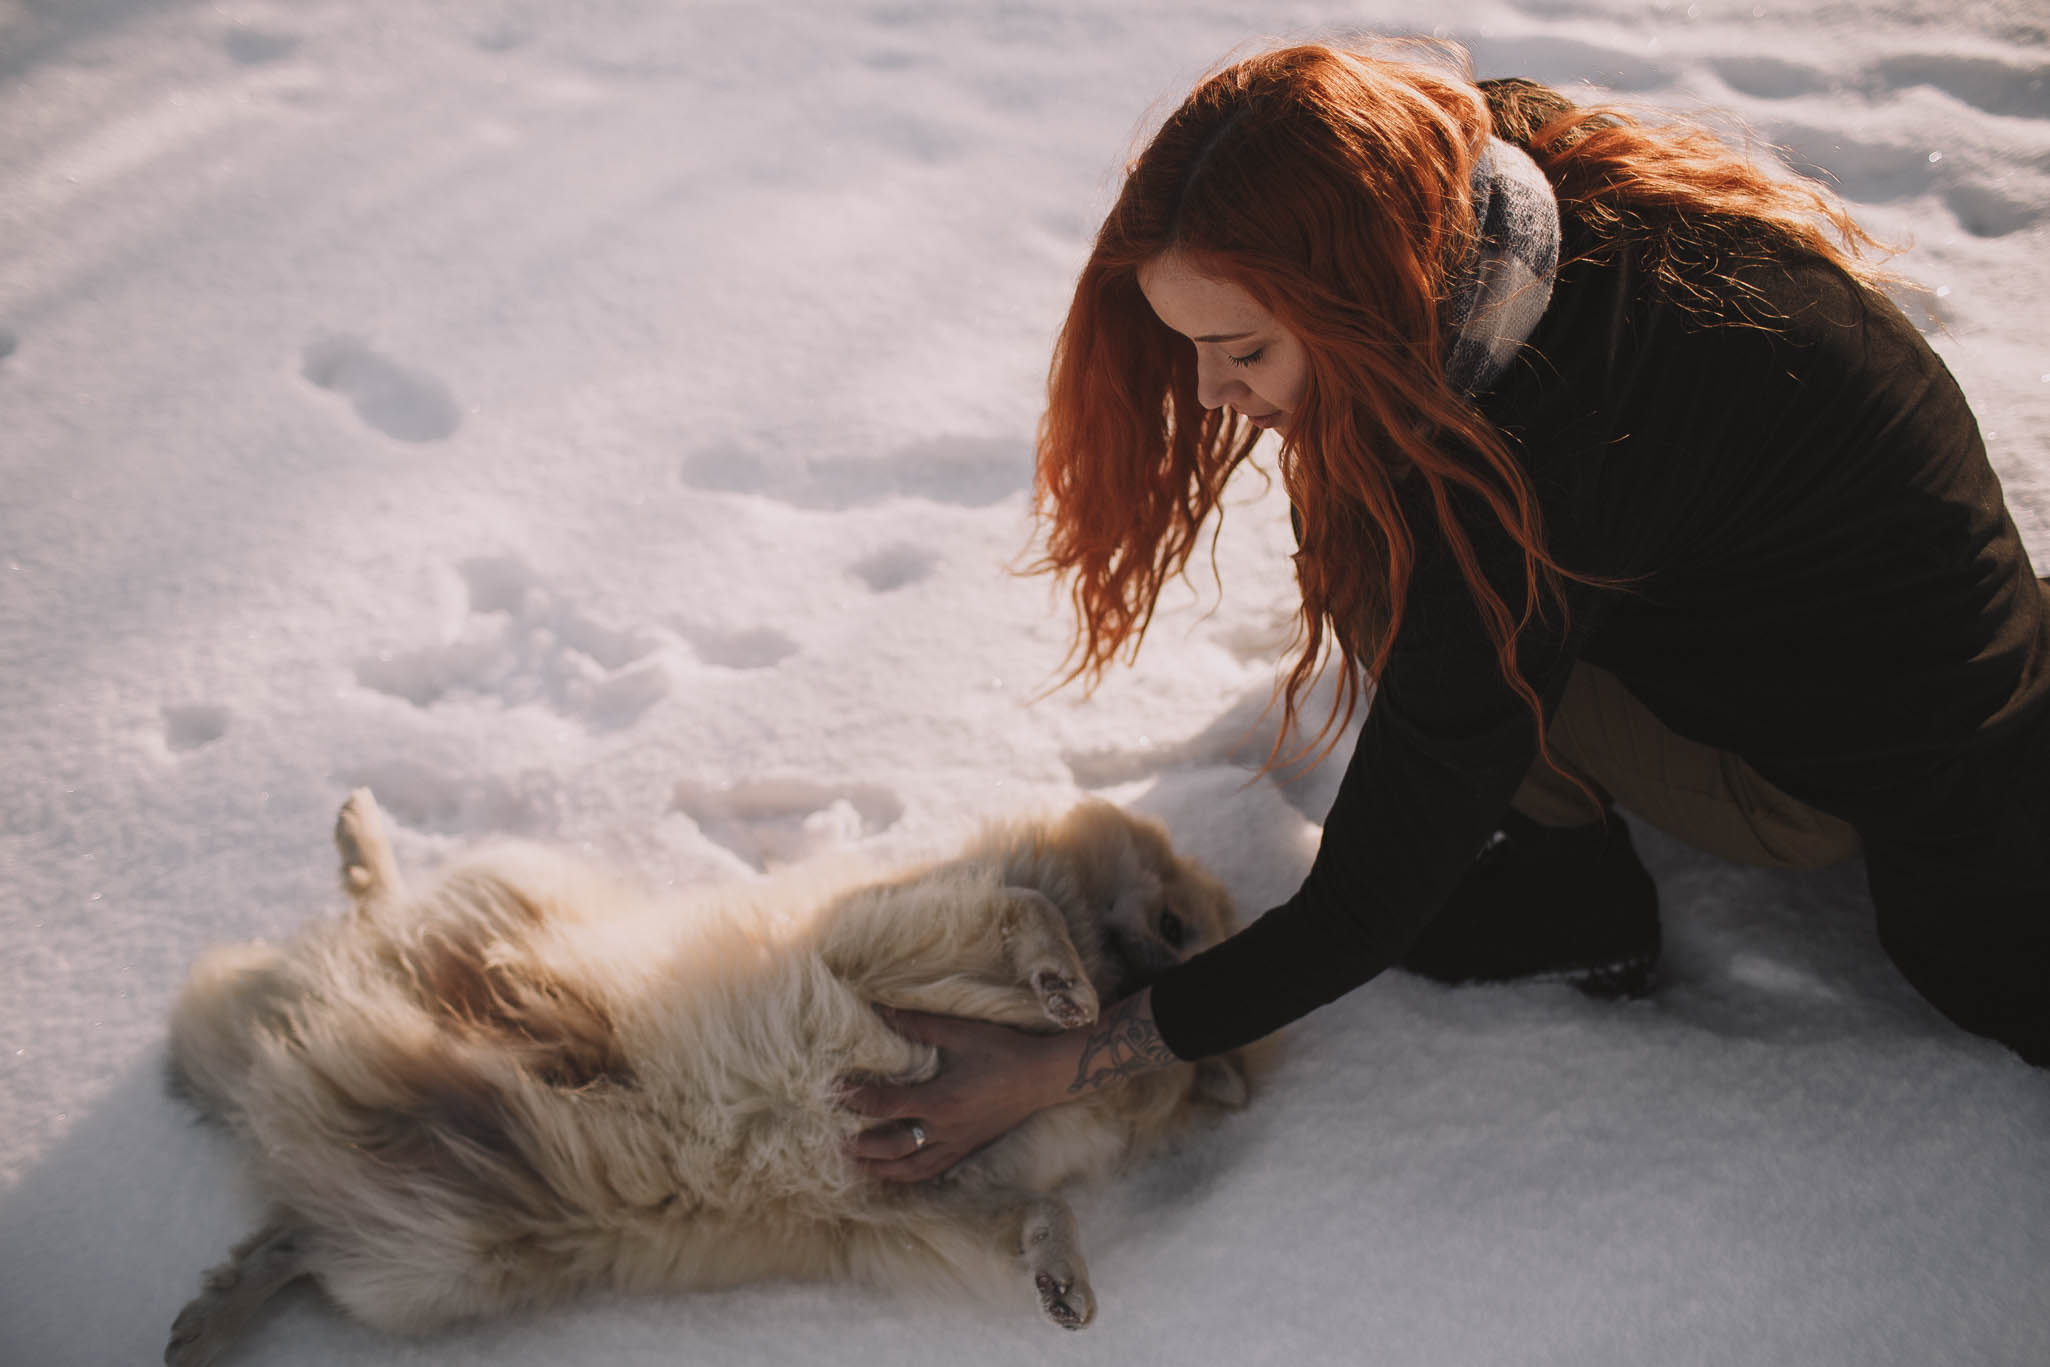 Road-trip-Islande-Iceland-Voyage-Travel-Portrait-Jérémy-Boyer-Sunny-day-dog-snow-14.jpg